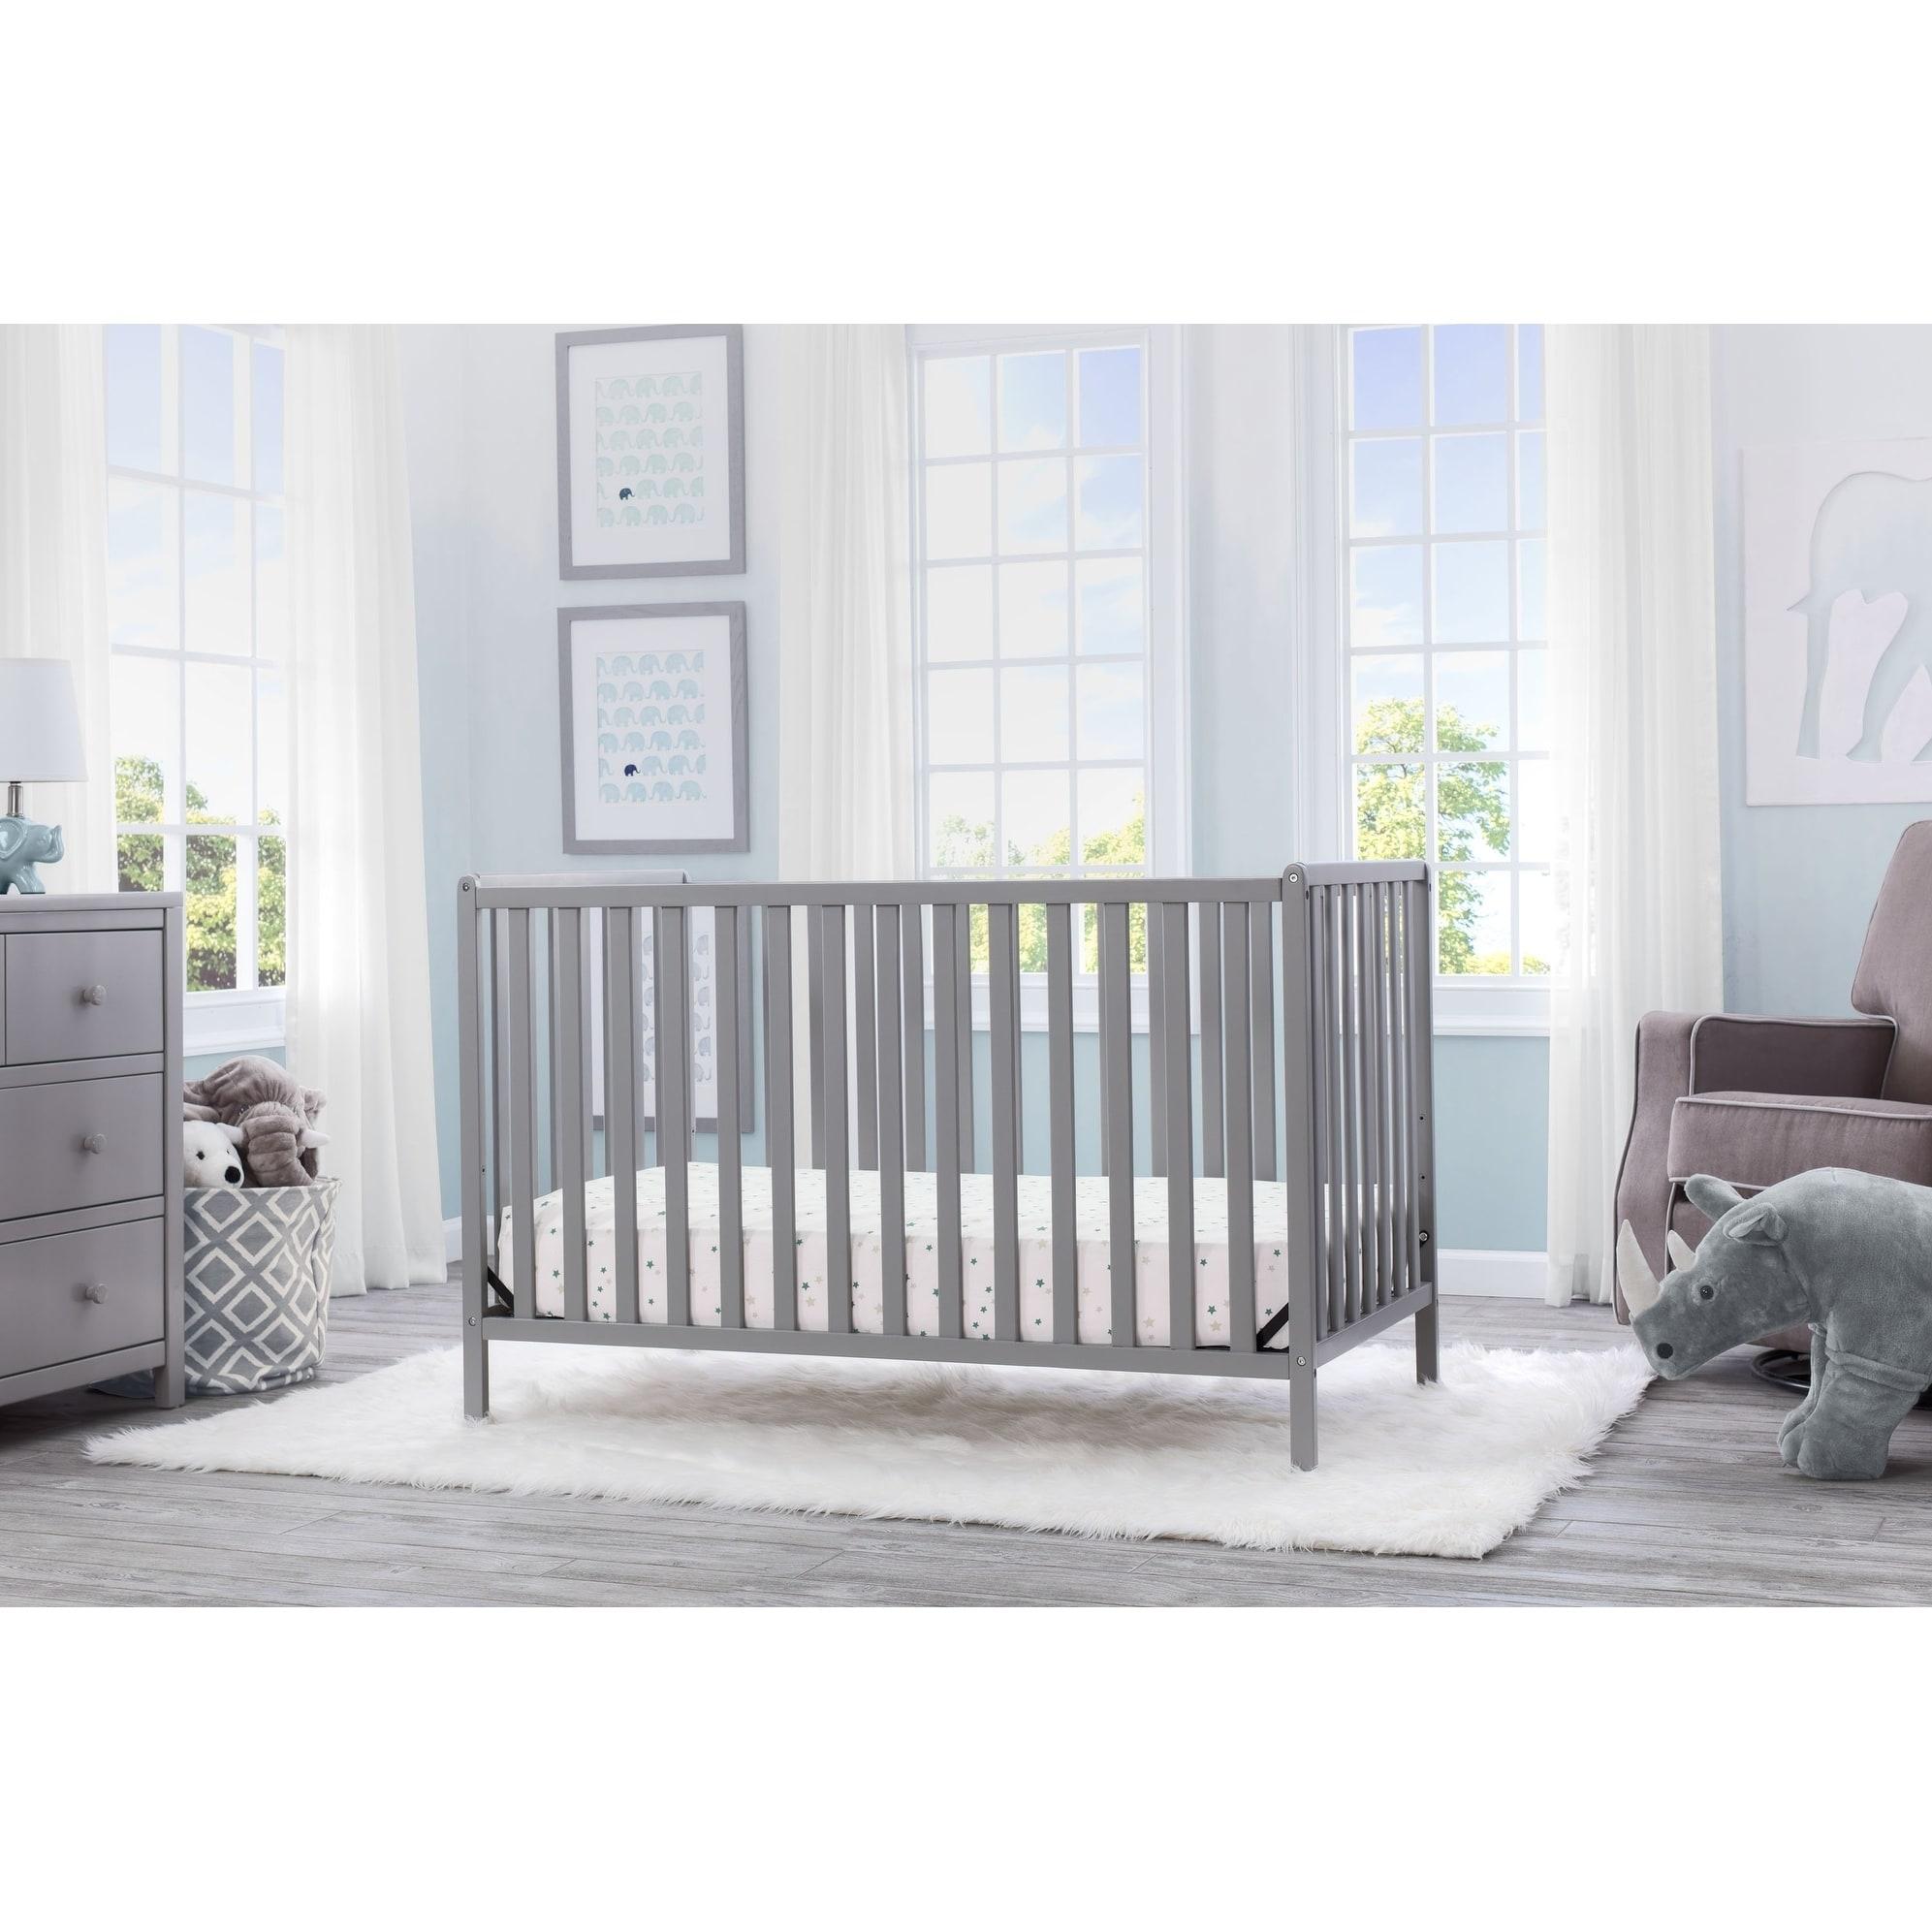 Delta Children Heartland 4 In 1 Convertible Crib Grey Overstock 17177106